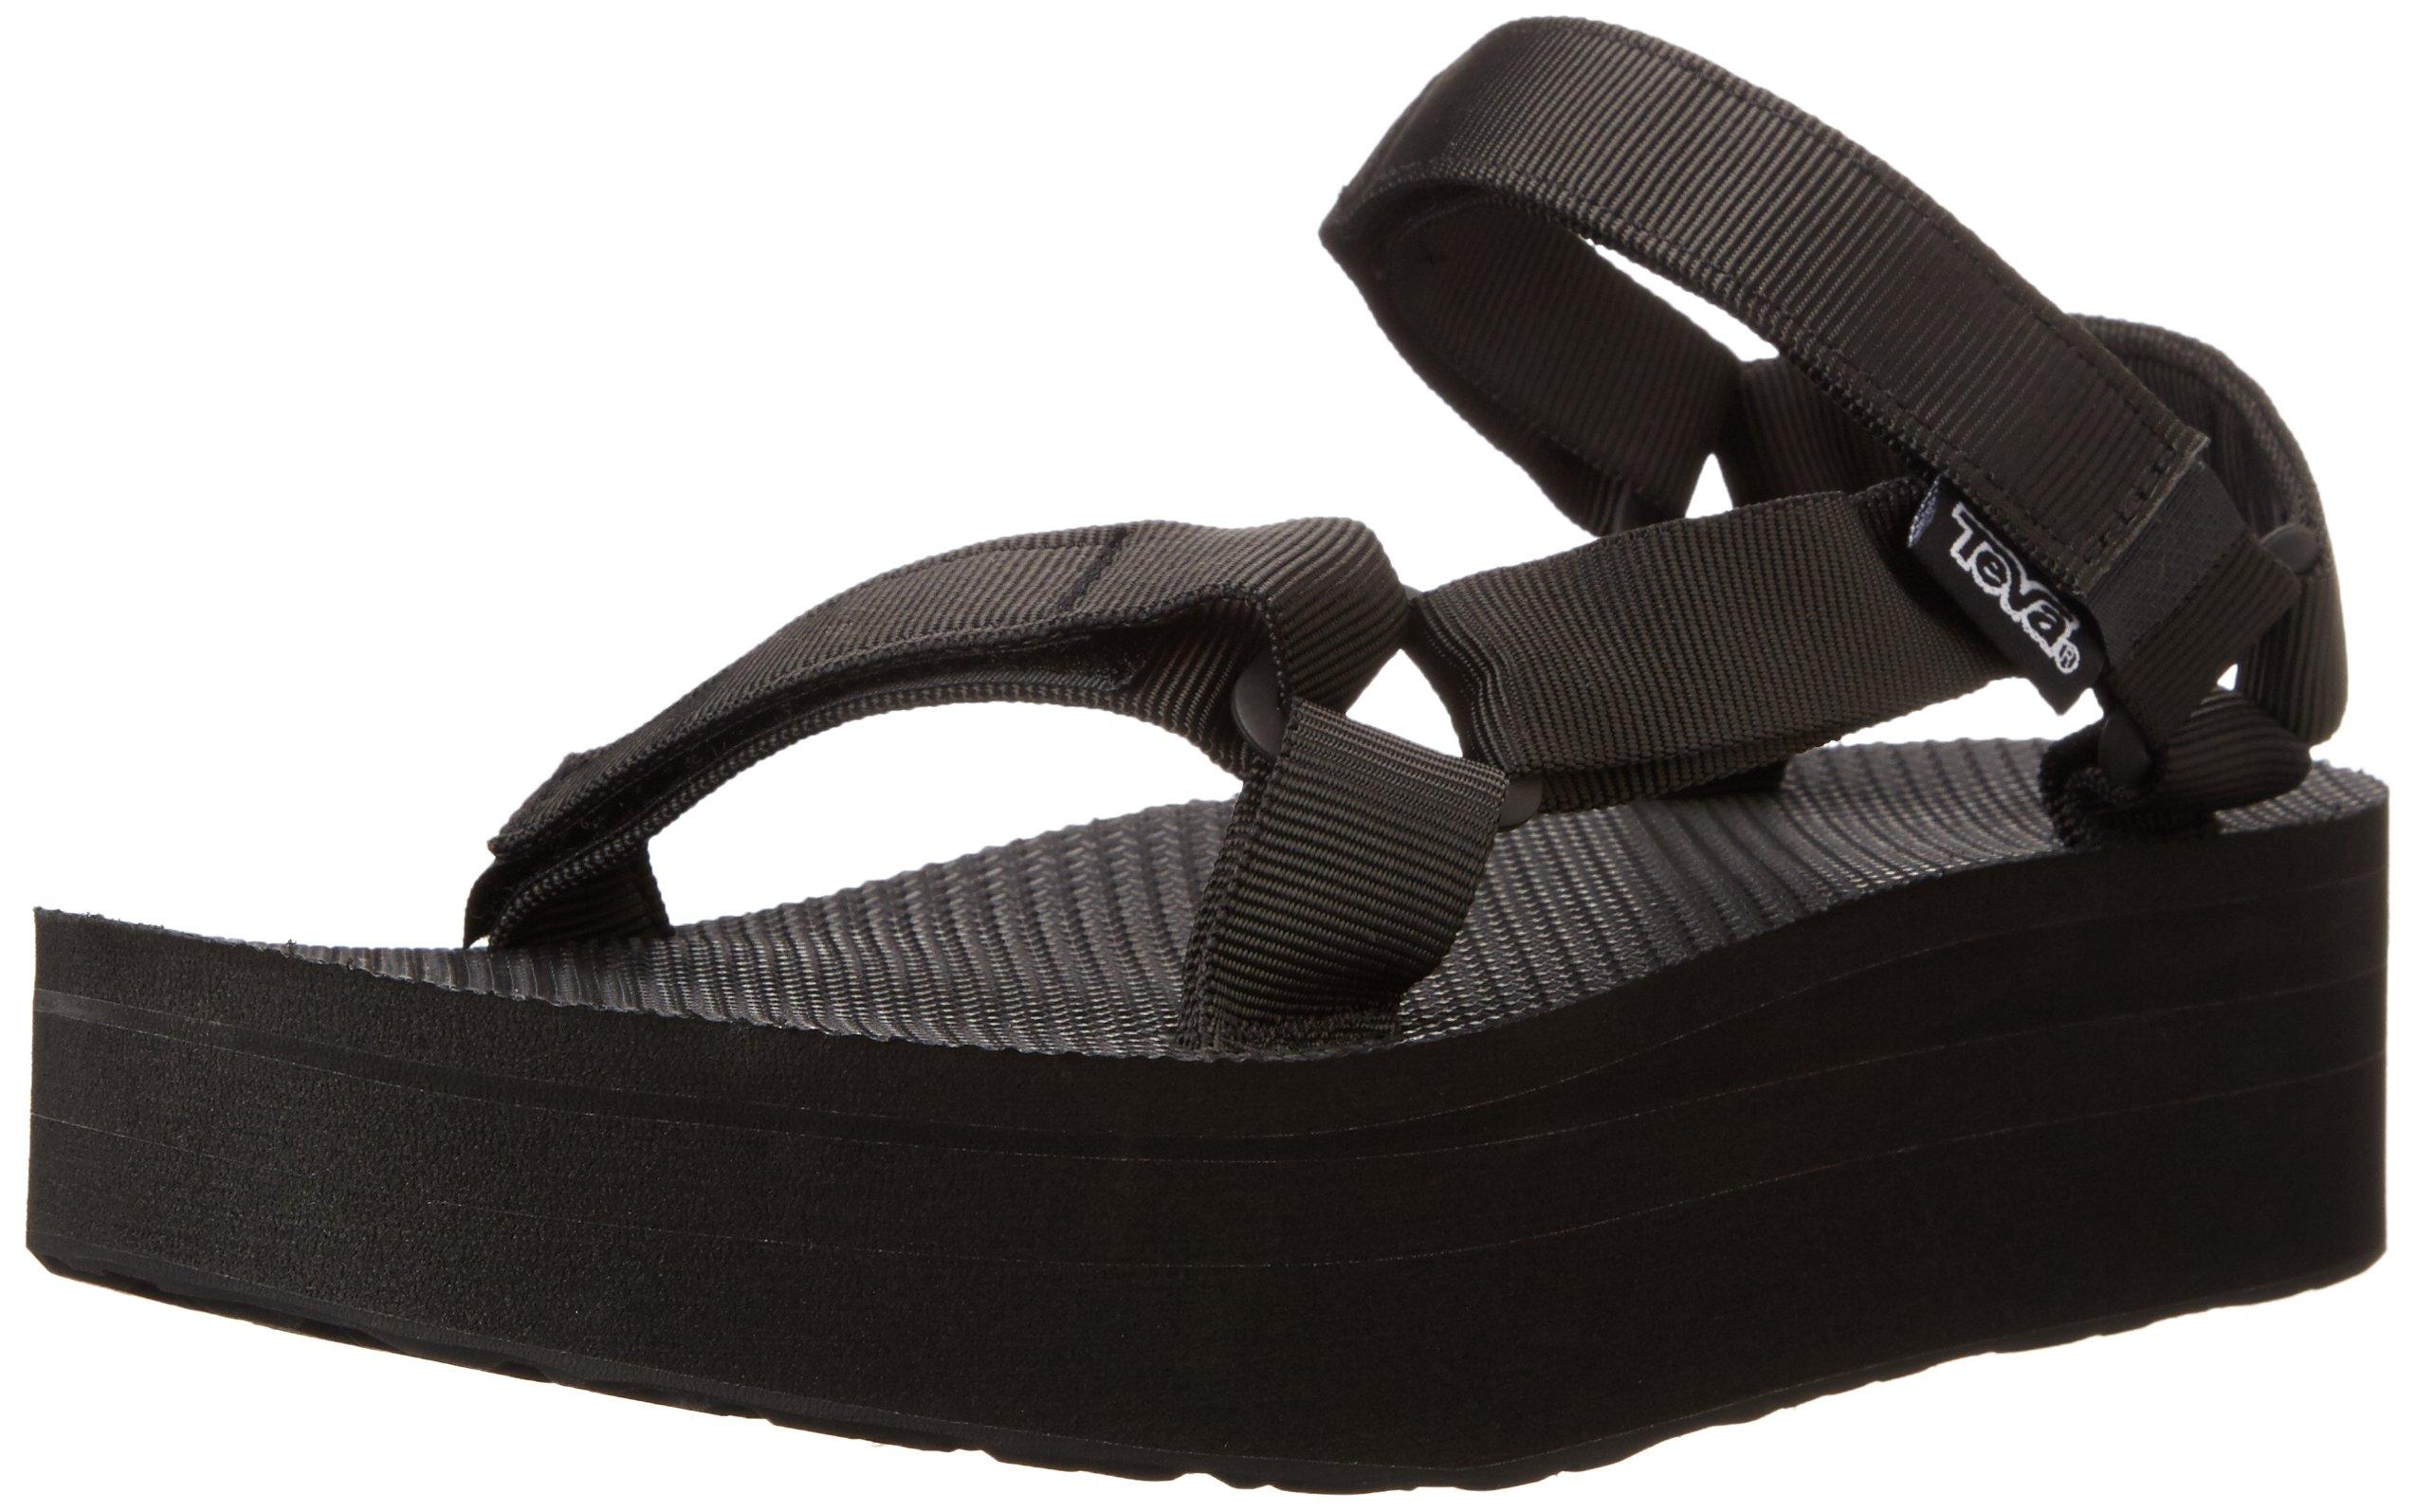 Teva Women's Flatform Universal Platform Sandal, Black, 6 M US by Teva